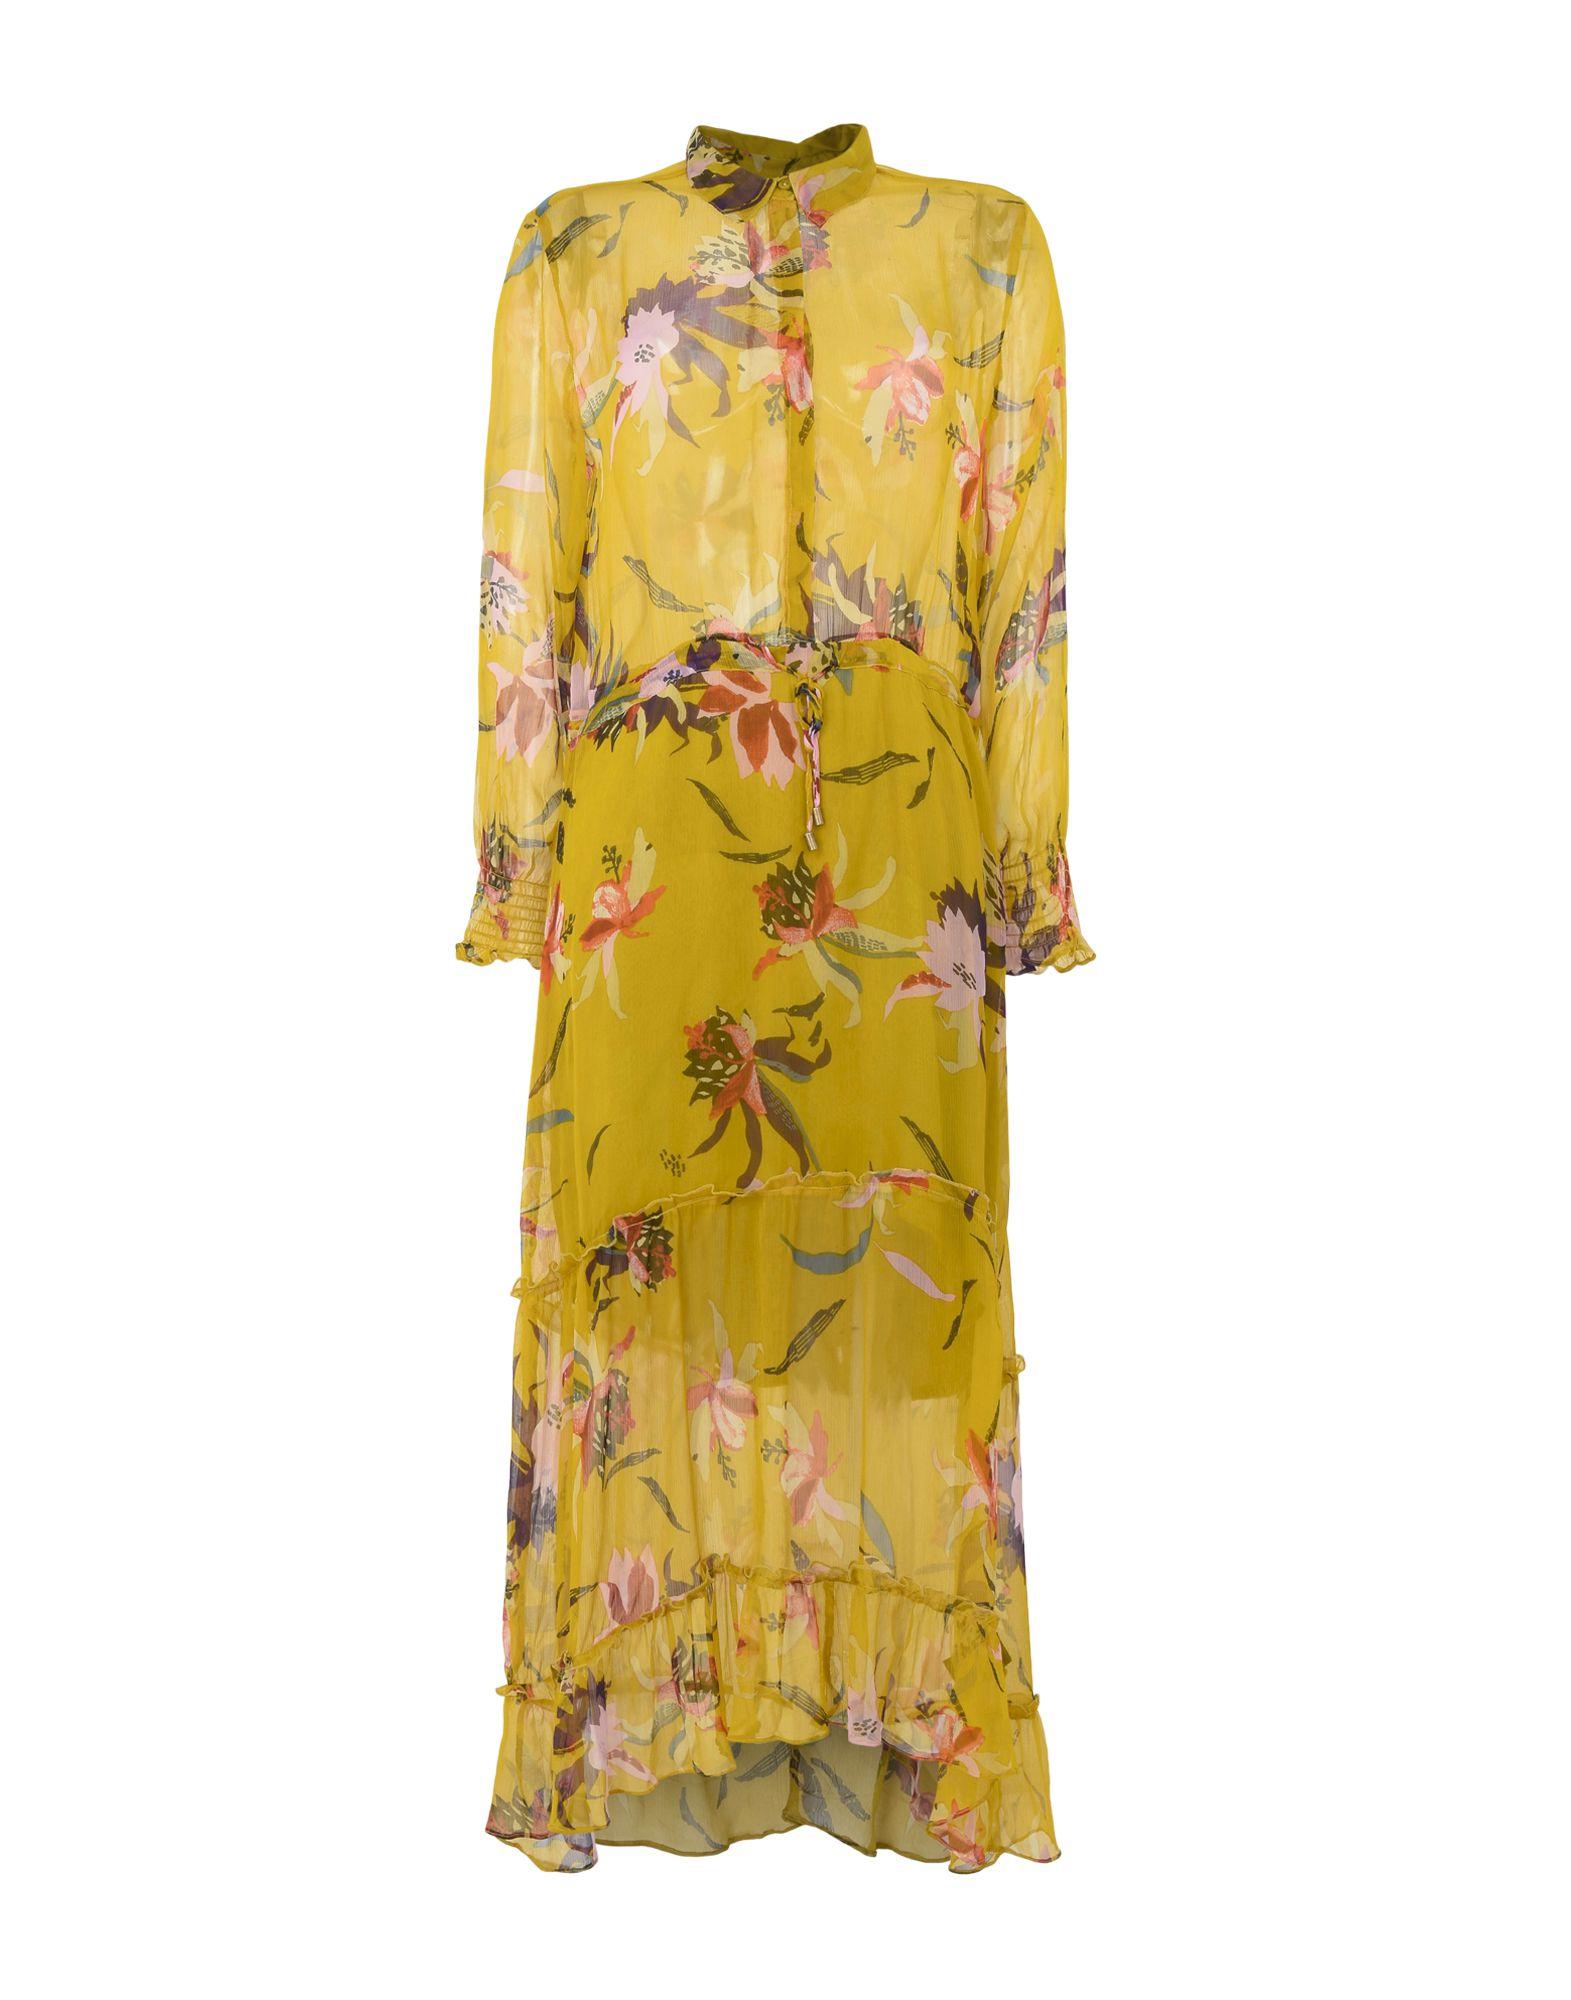 MBYM Midi Dress in Ocher